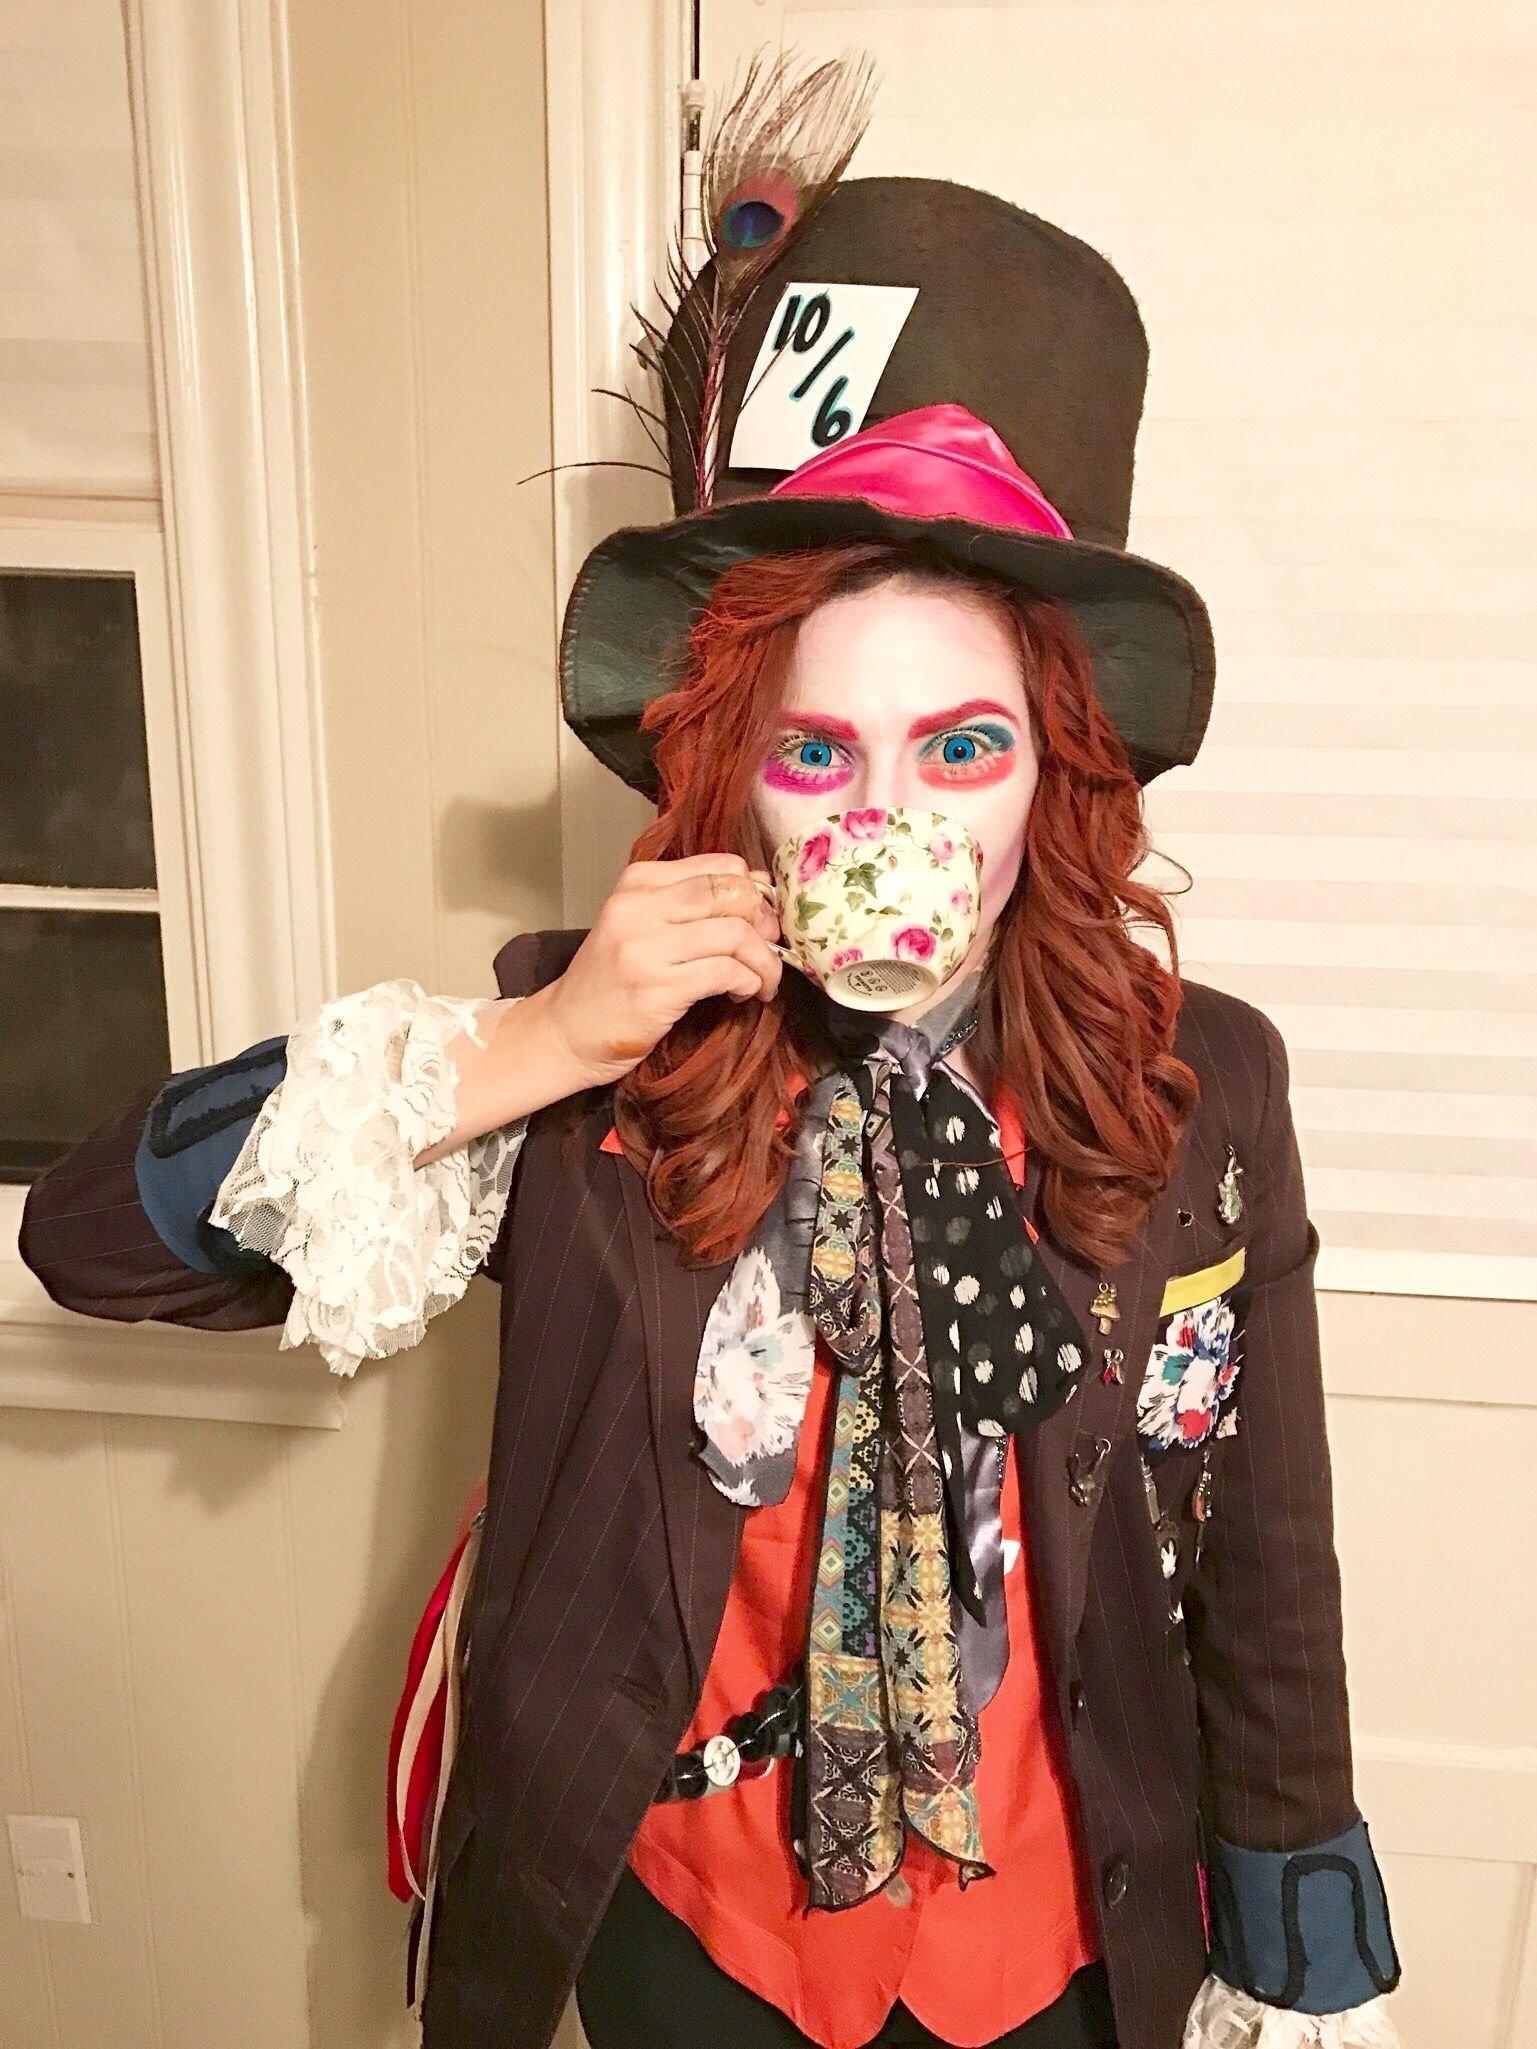 10 Perfect Female Mad Hatter Costume Ideas mad hatter costume diy jacket diy hat makeup halloween pinterest 2020